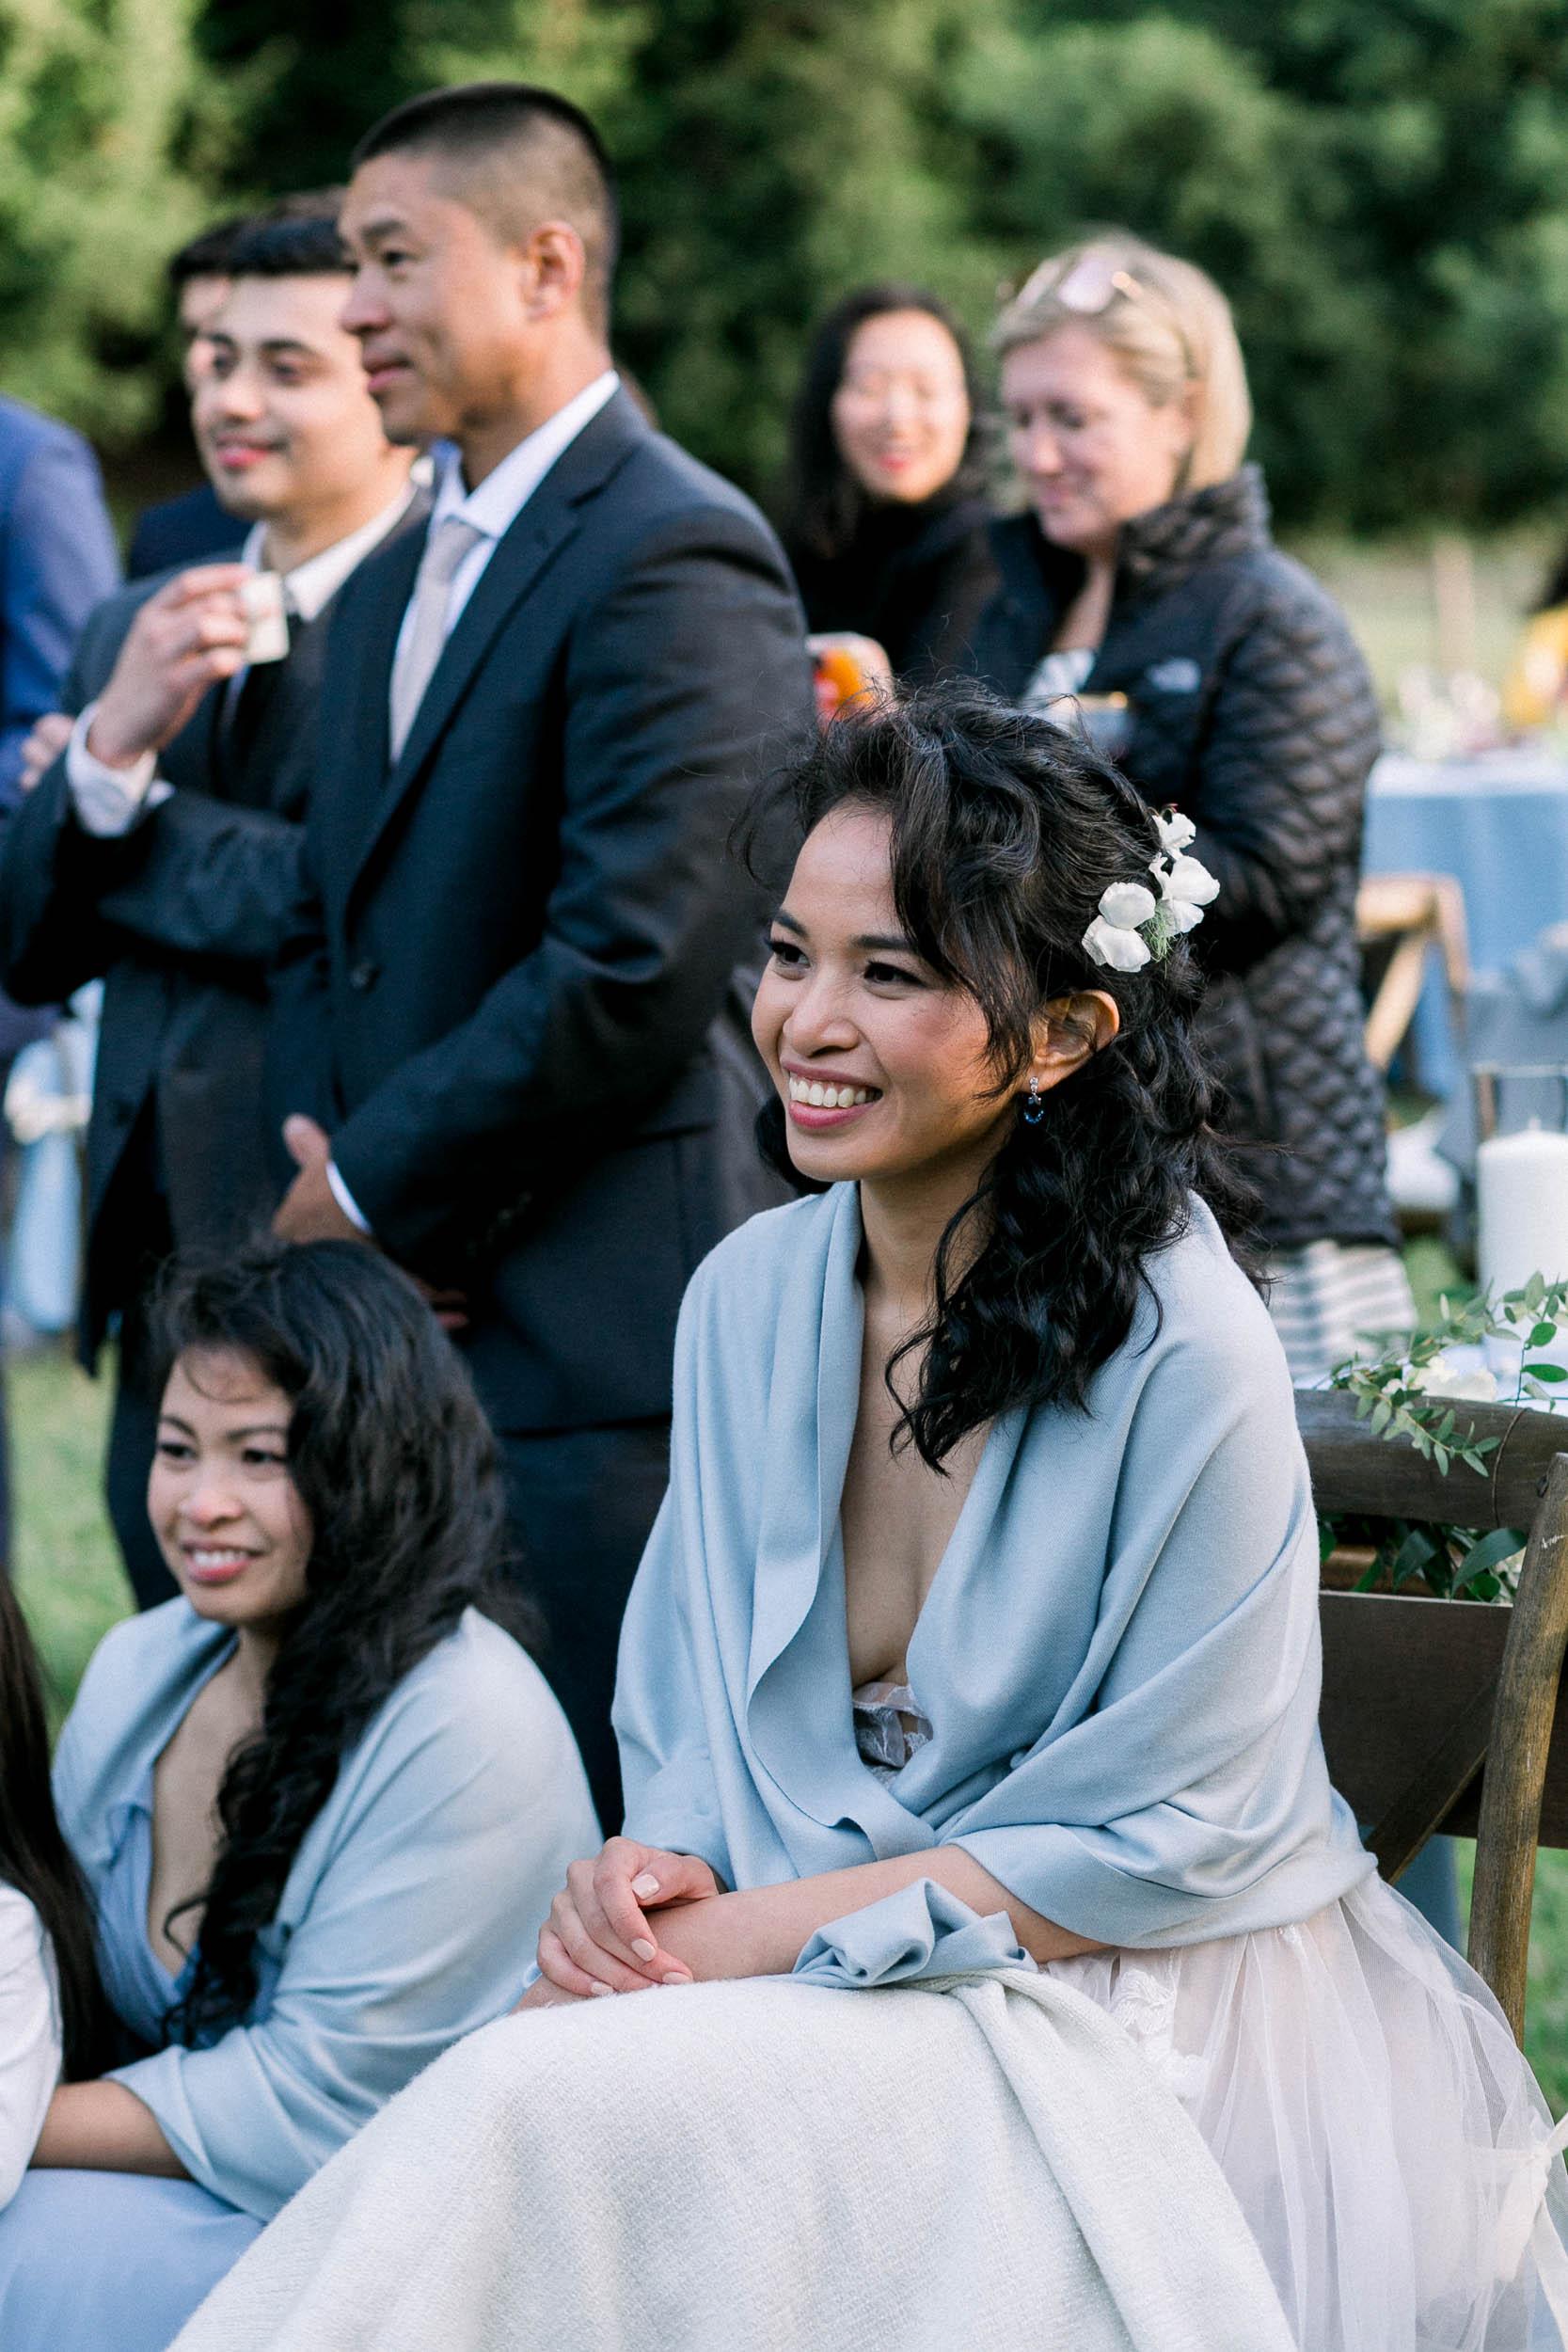 052519_B+S_Hidden Villa Wedding_Buena Lane Photography__TP14282.jpg